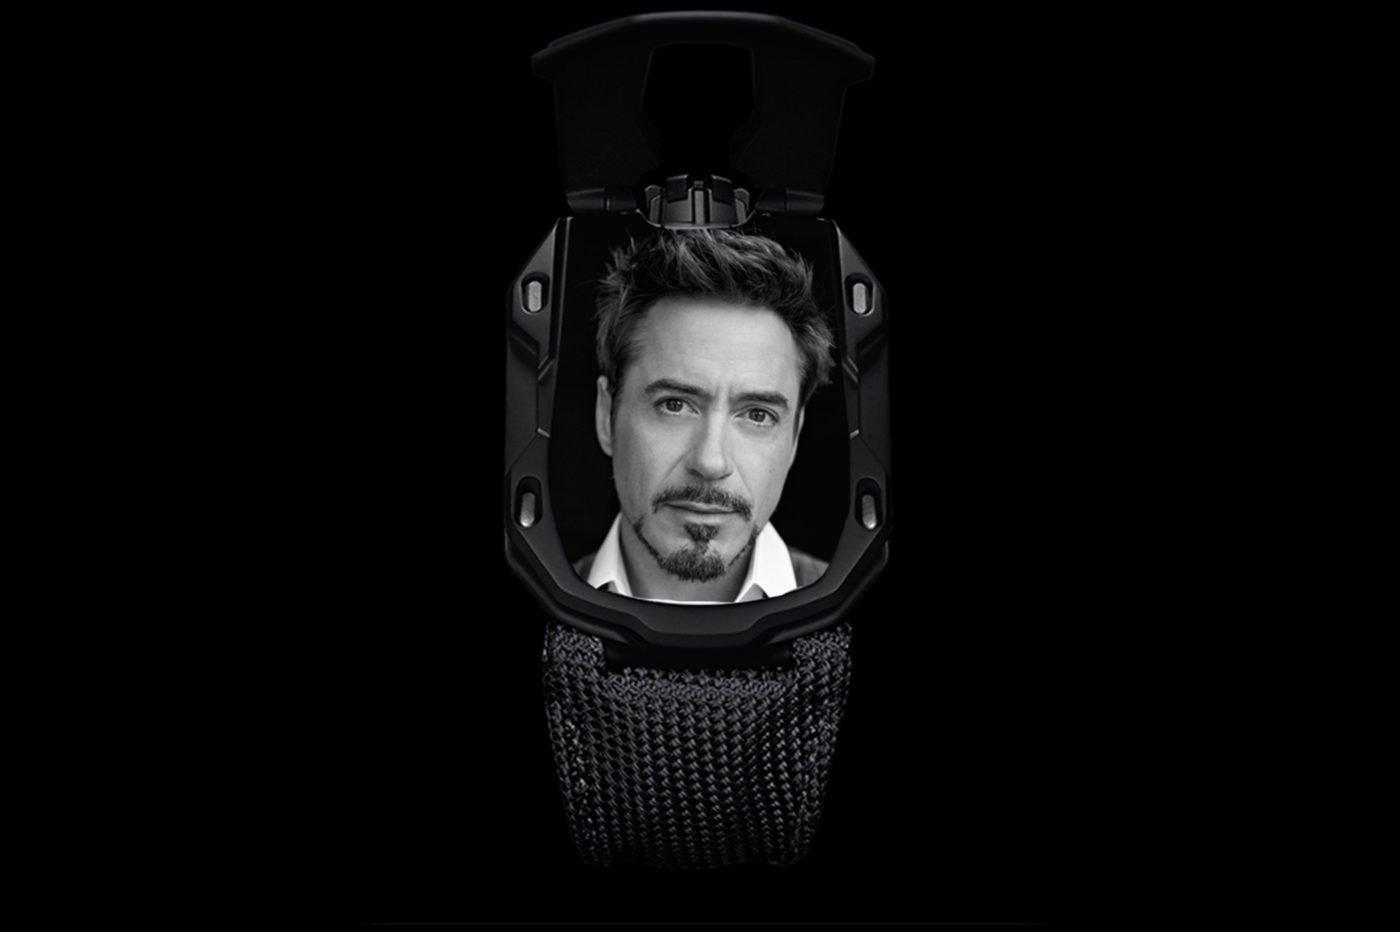 Timebloid Zegarki w showbiznesie: Robert Downey Jr.